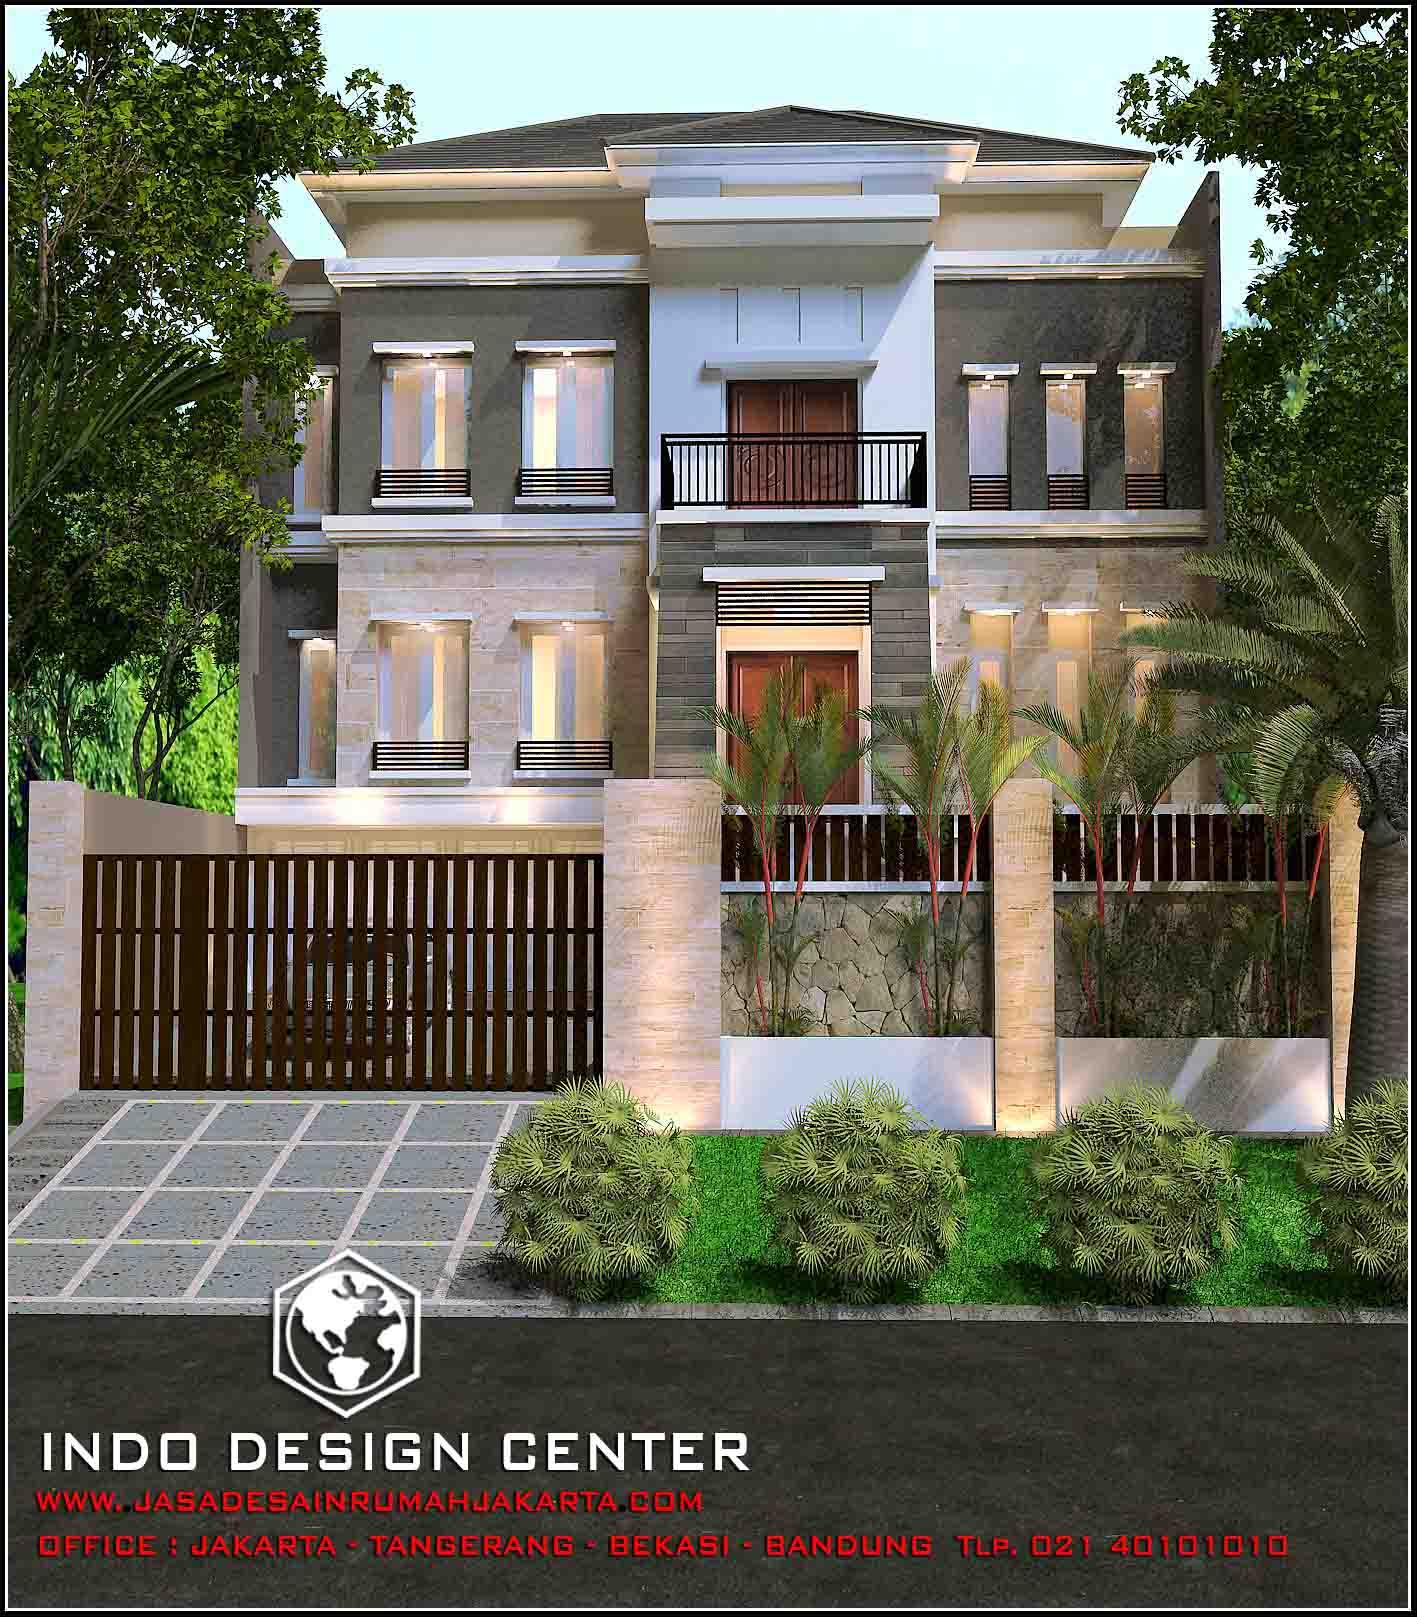 Jasa arsitek rumah minimalis di jakarta jasa desain for Arsitek di jakarta